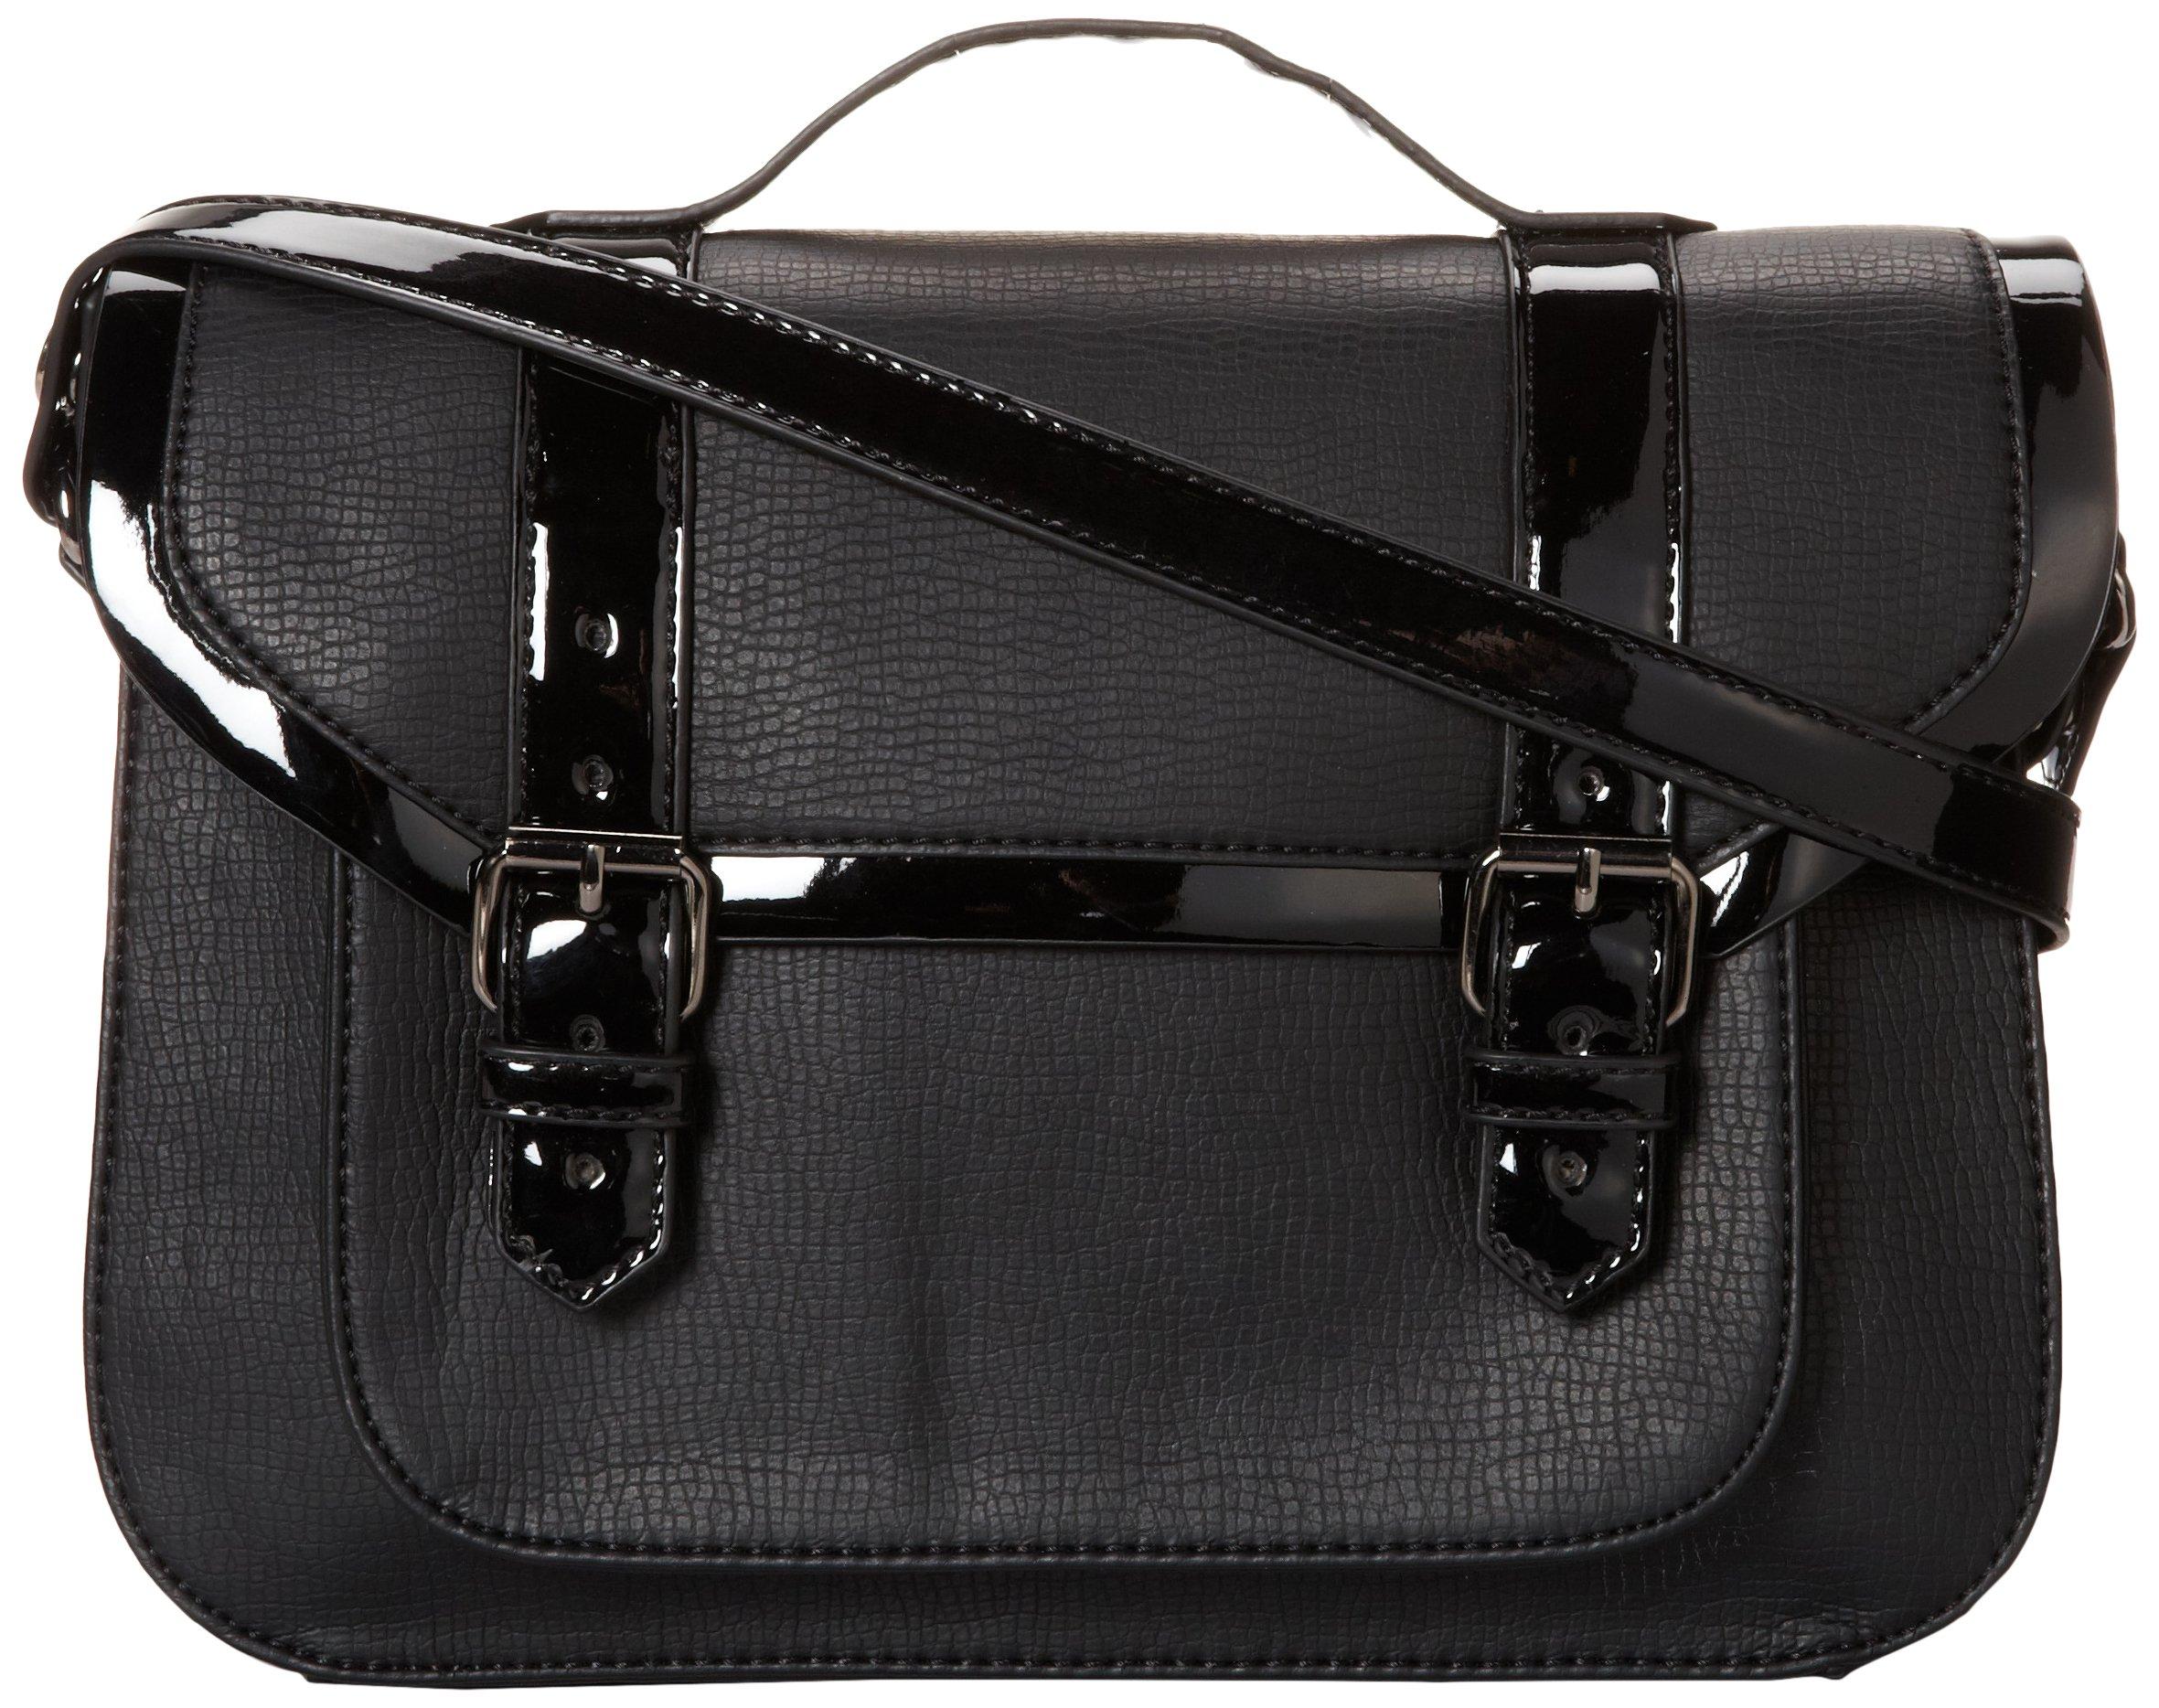 BCBGeneration Carmen Patent Le Carine Roitfeld 256GN Backpack,Black,One Size